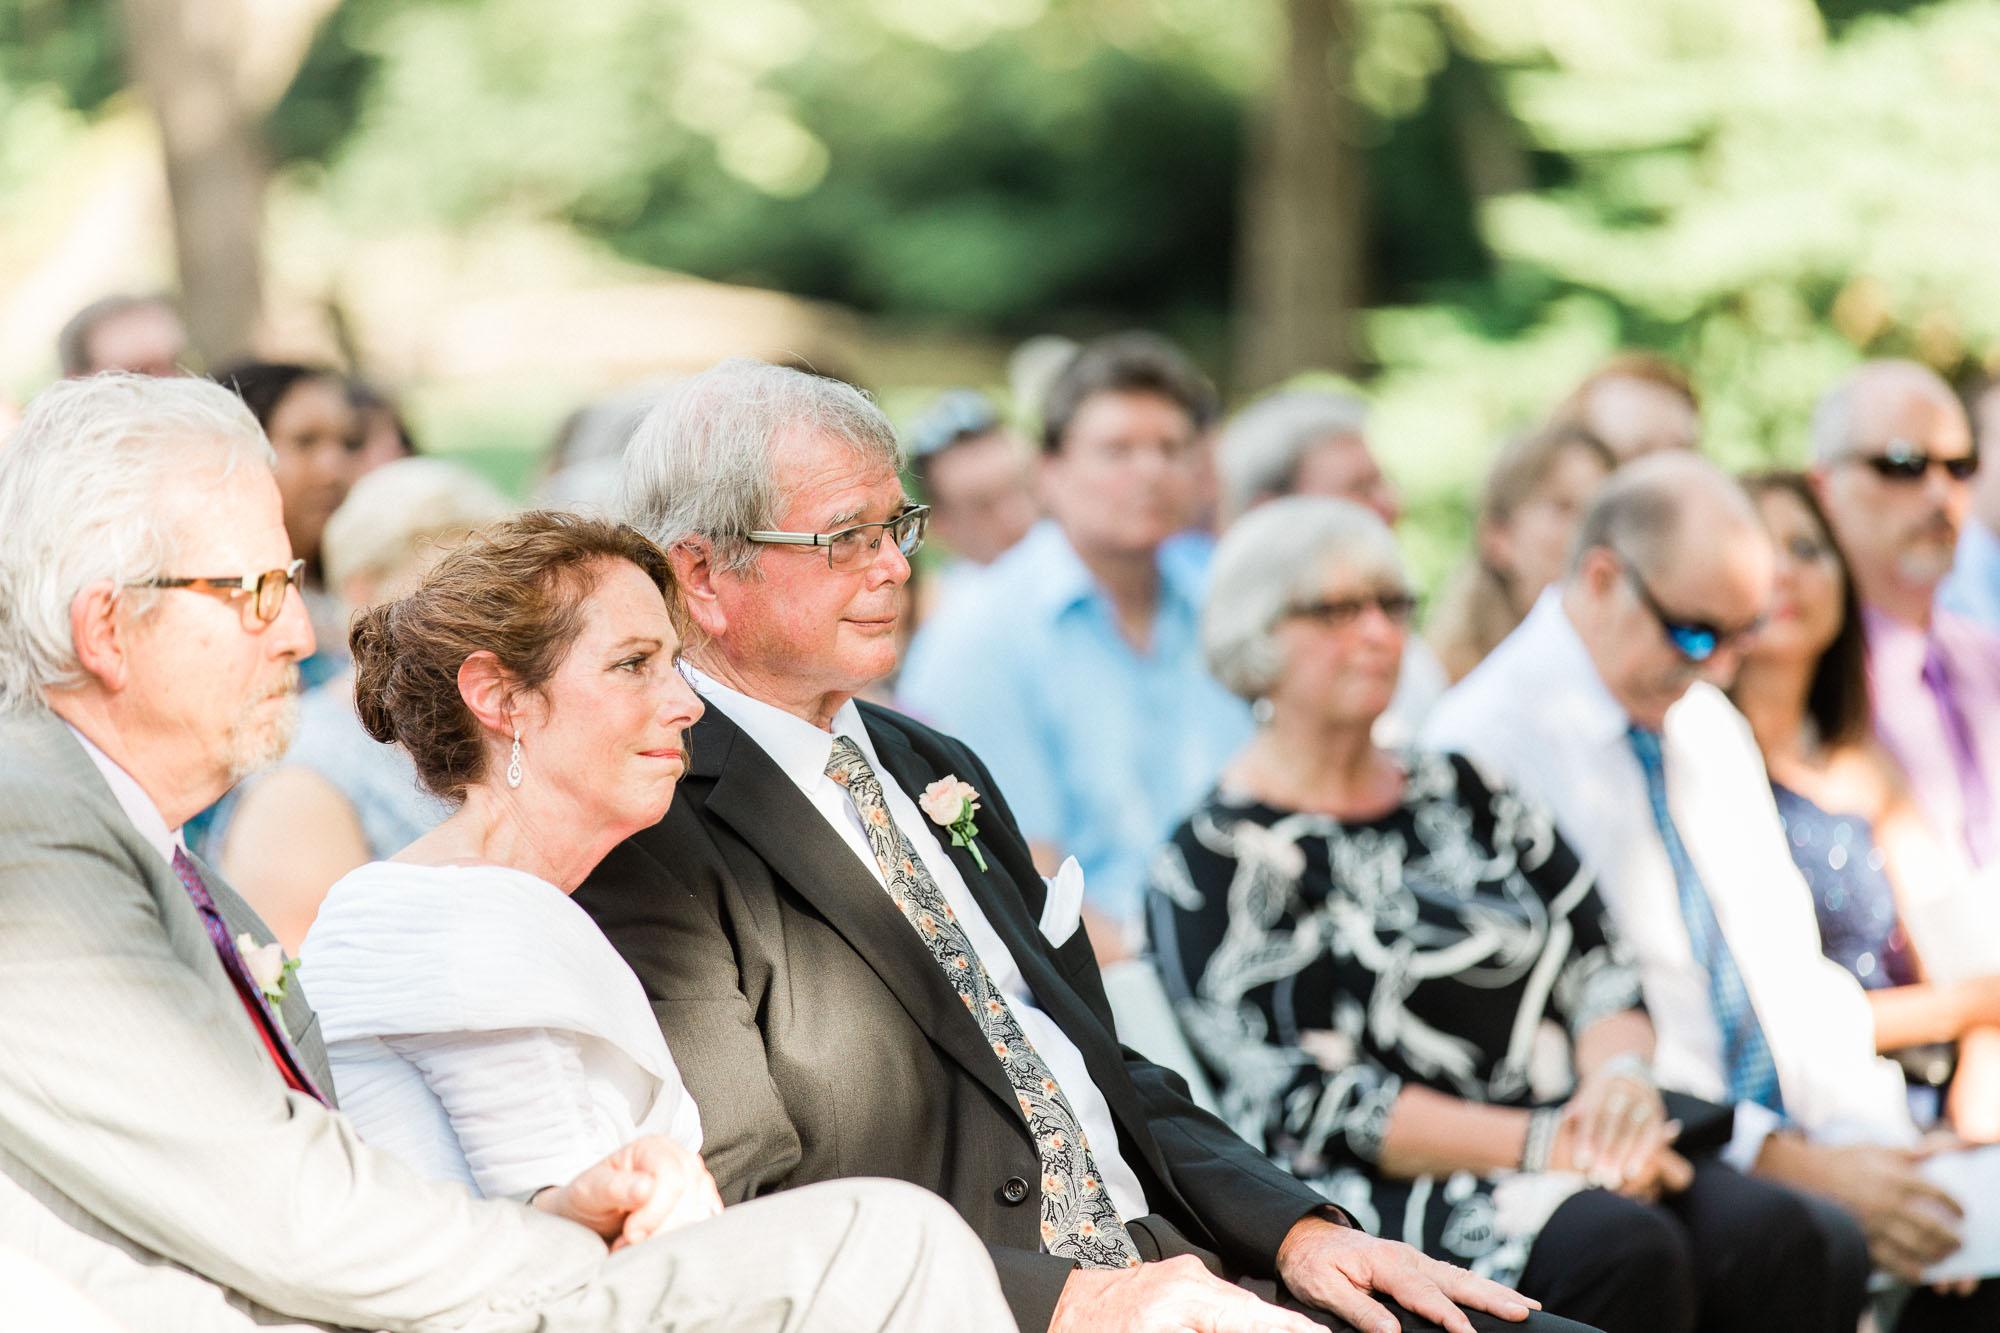 Allenberry-resort-historic-pennsylvania-wedding-21995.jpg